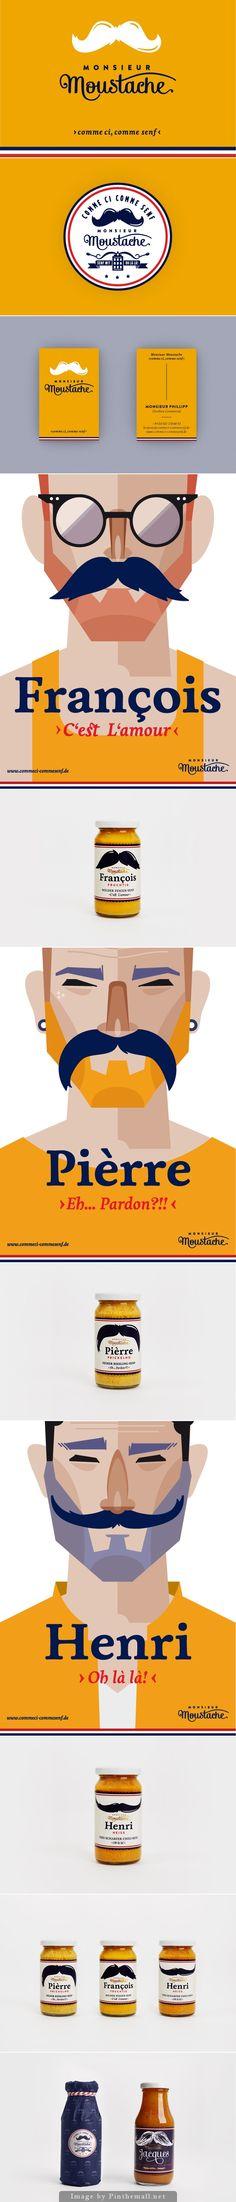 Monsieur Moustache Mustards